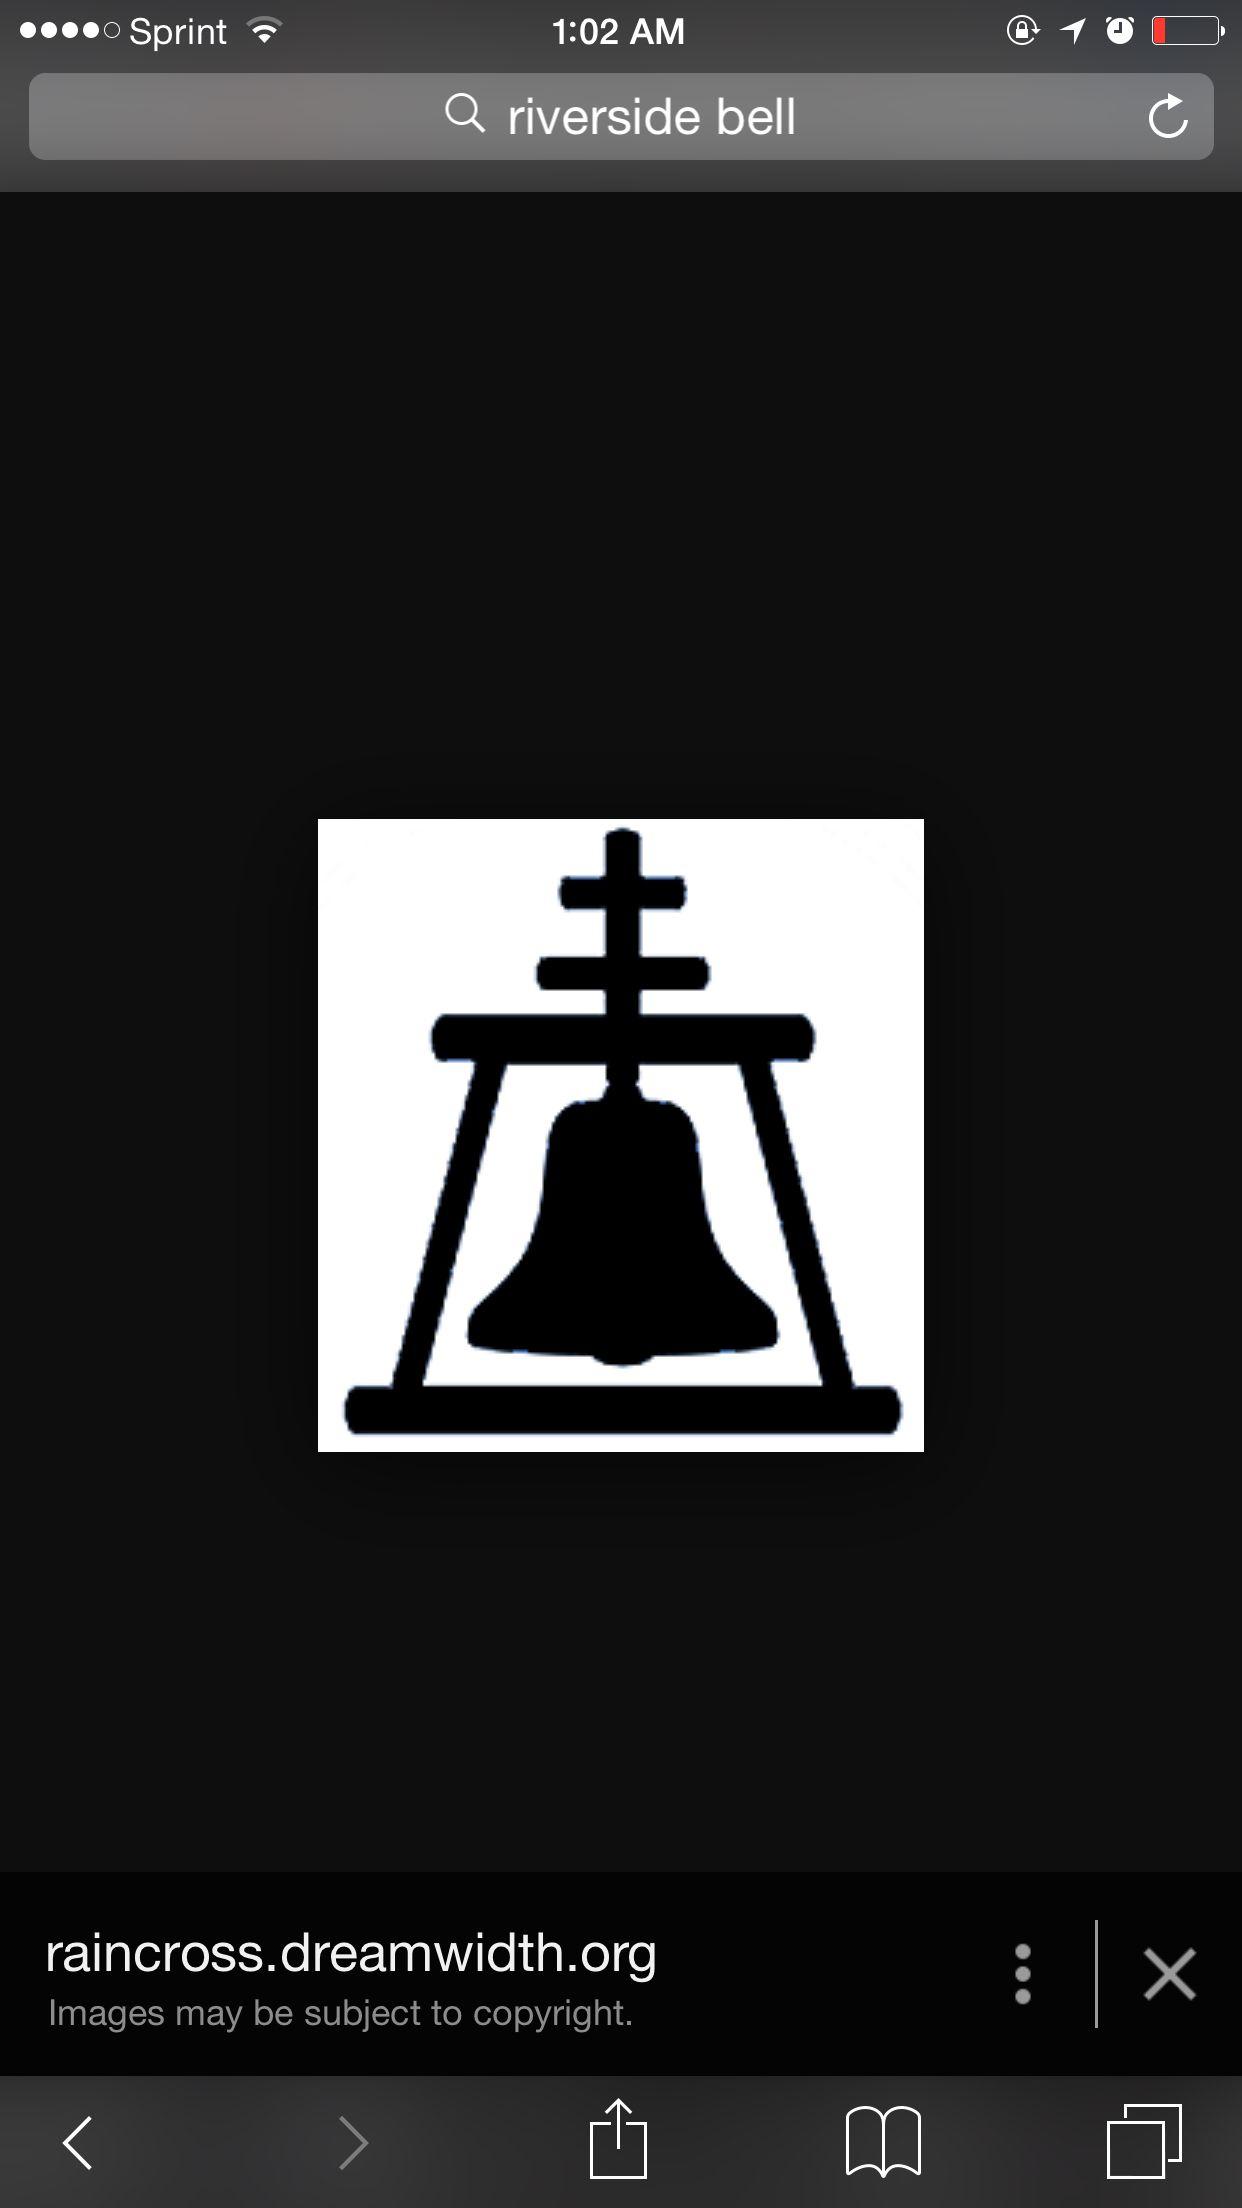 riverside bell tattoo ideas pinterest body art and tattoo rh pinterest com IE Riverside Bell Logo Riverside Bell Printable